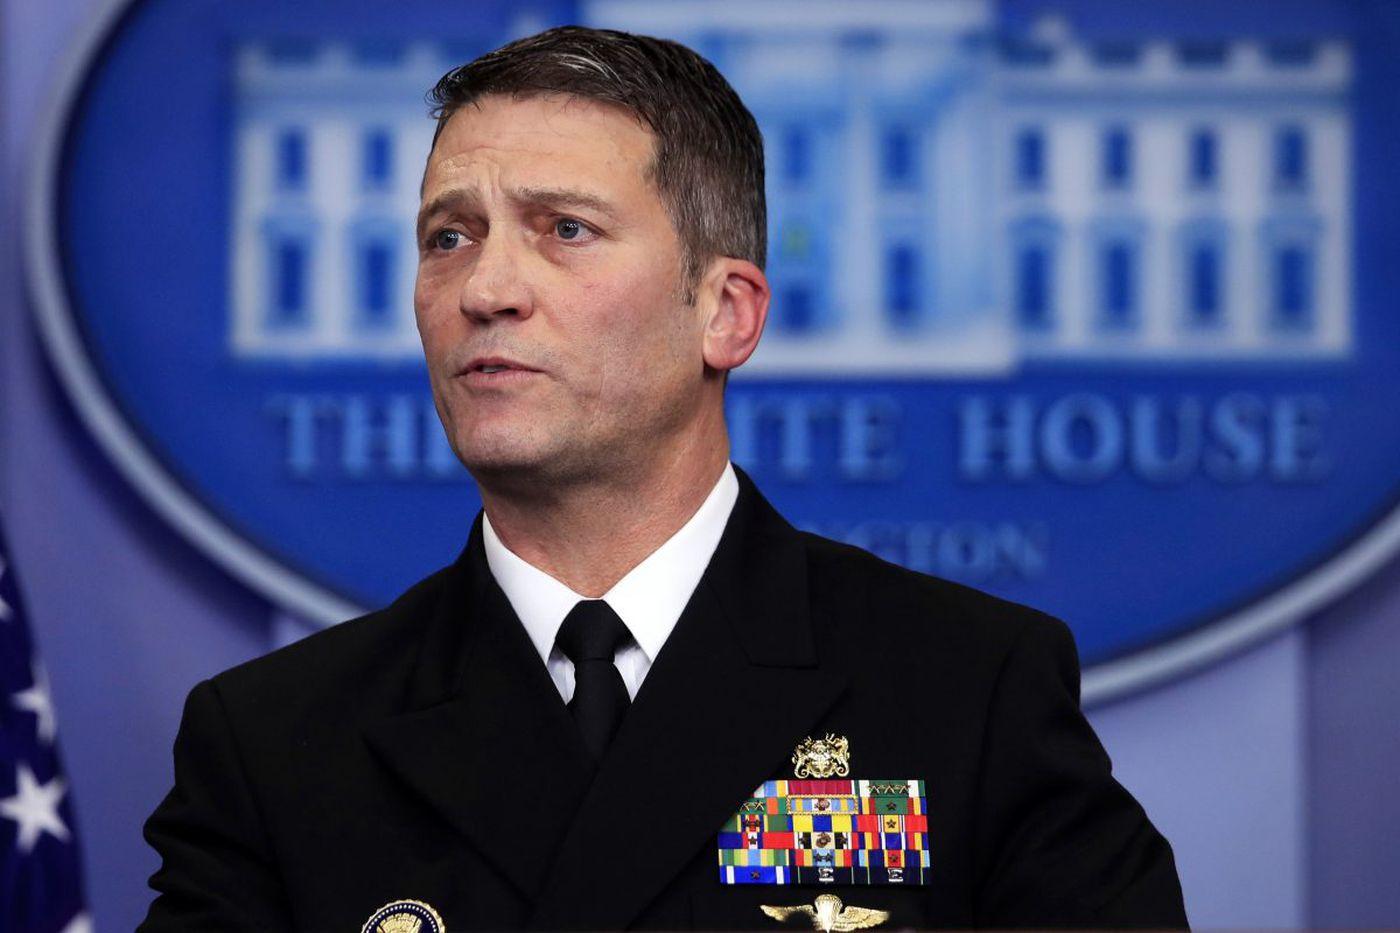 Senate Republicans express concerns about Trump's choice to lead Veterans Affairs